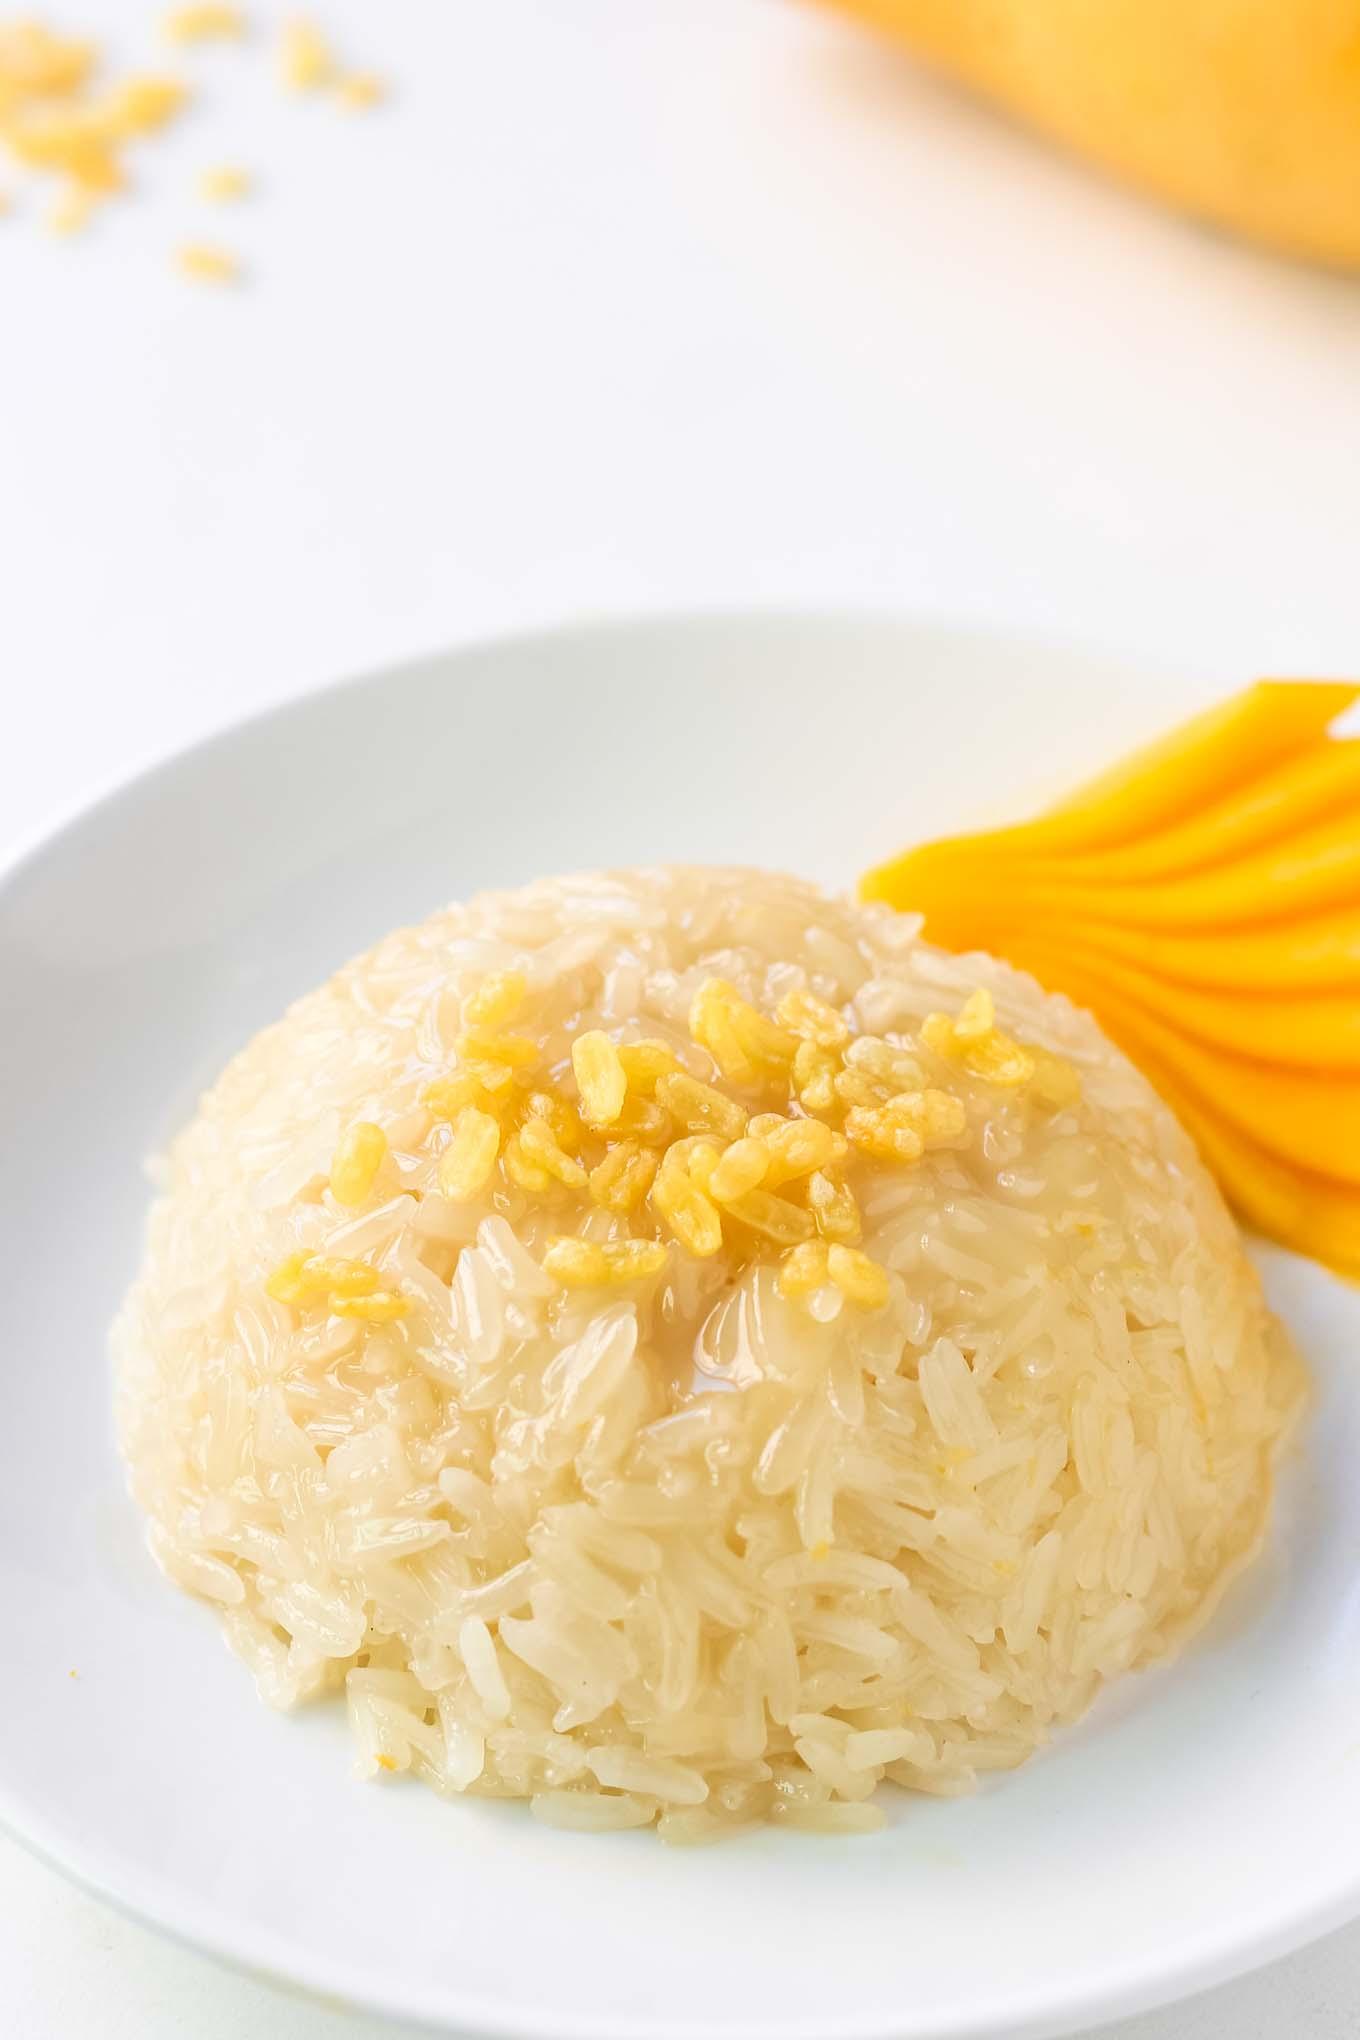 Sticky Rice with Mango Slices